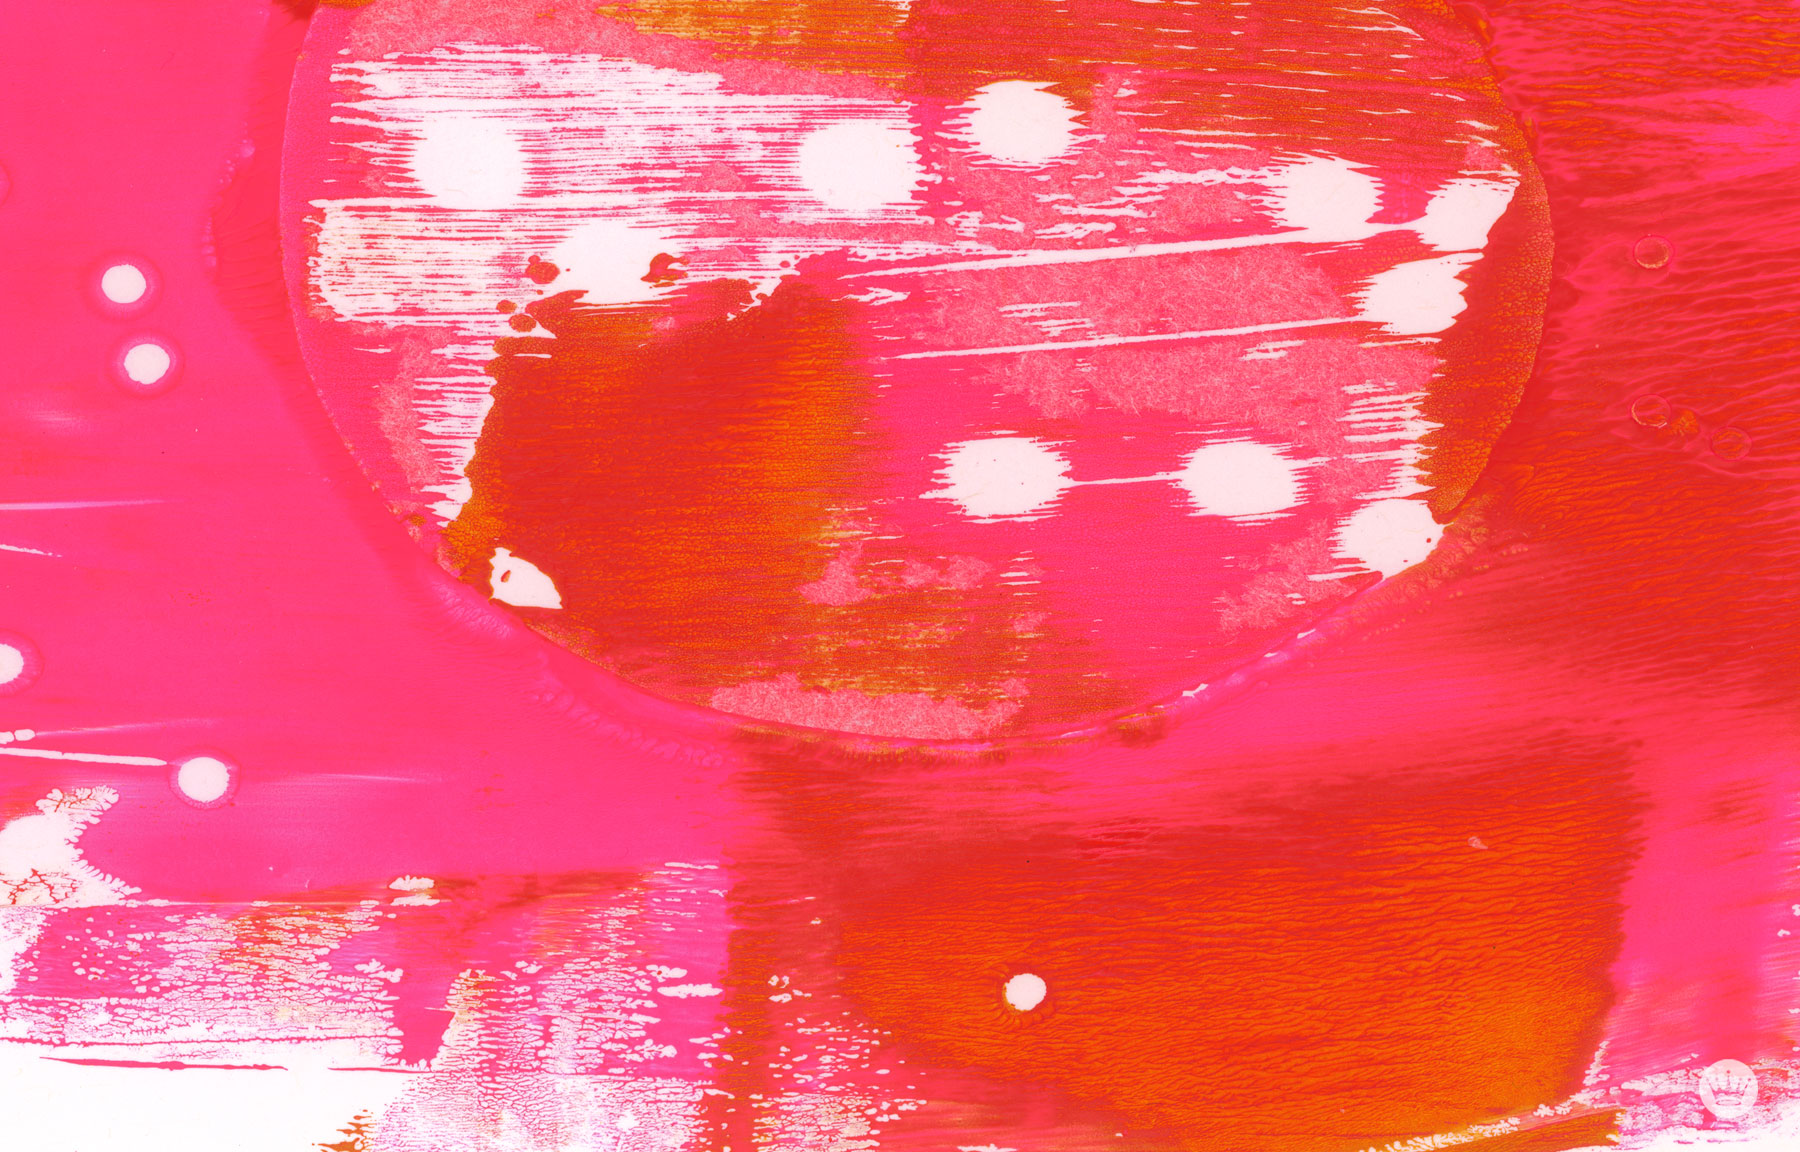 Free Desktop Wallpapers In Honor Of Breast Cancer Awareness